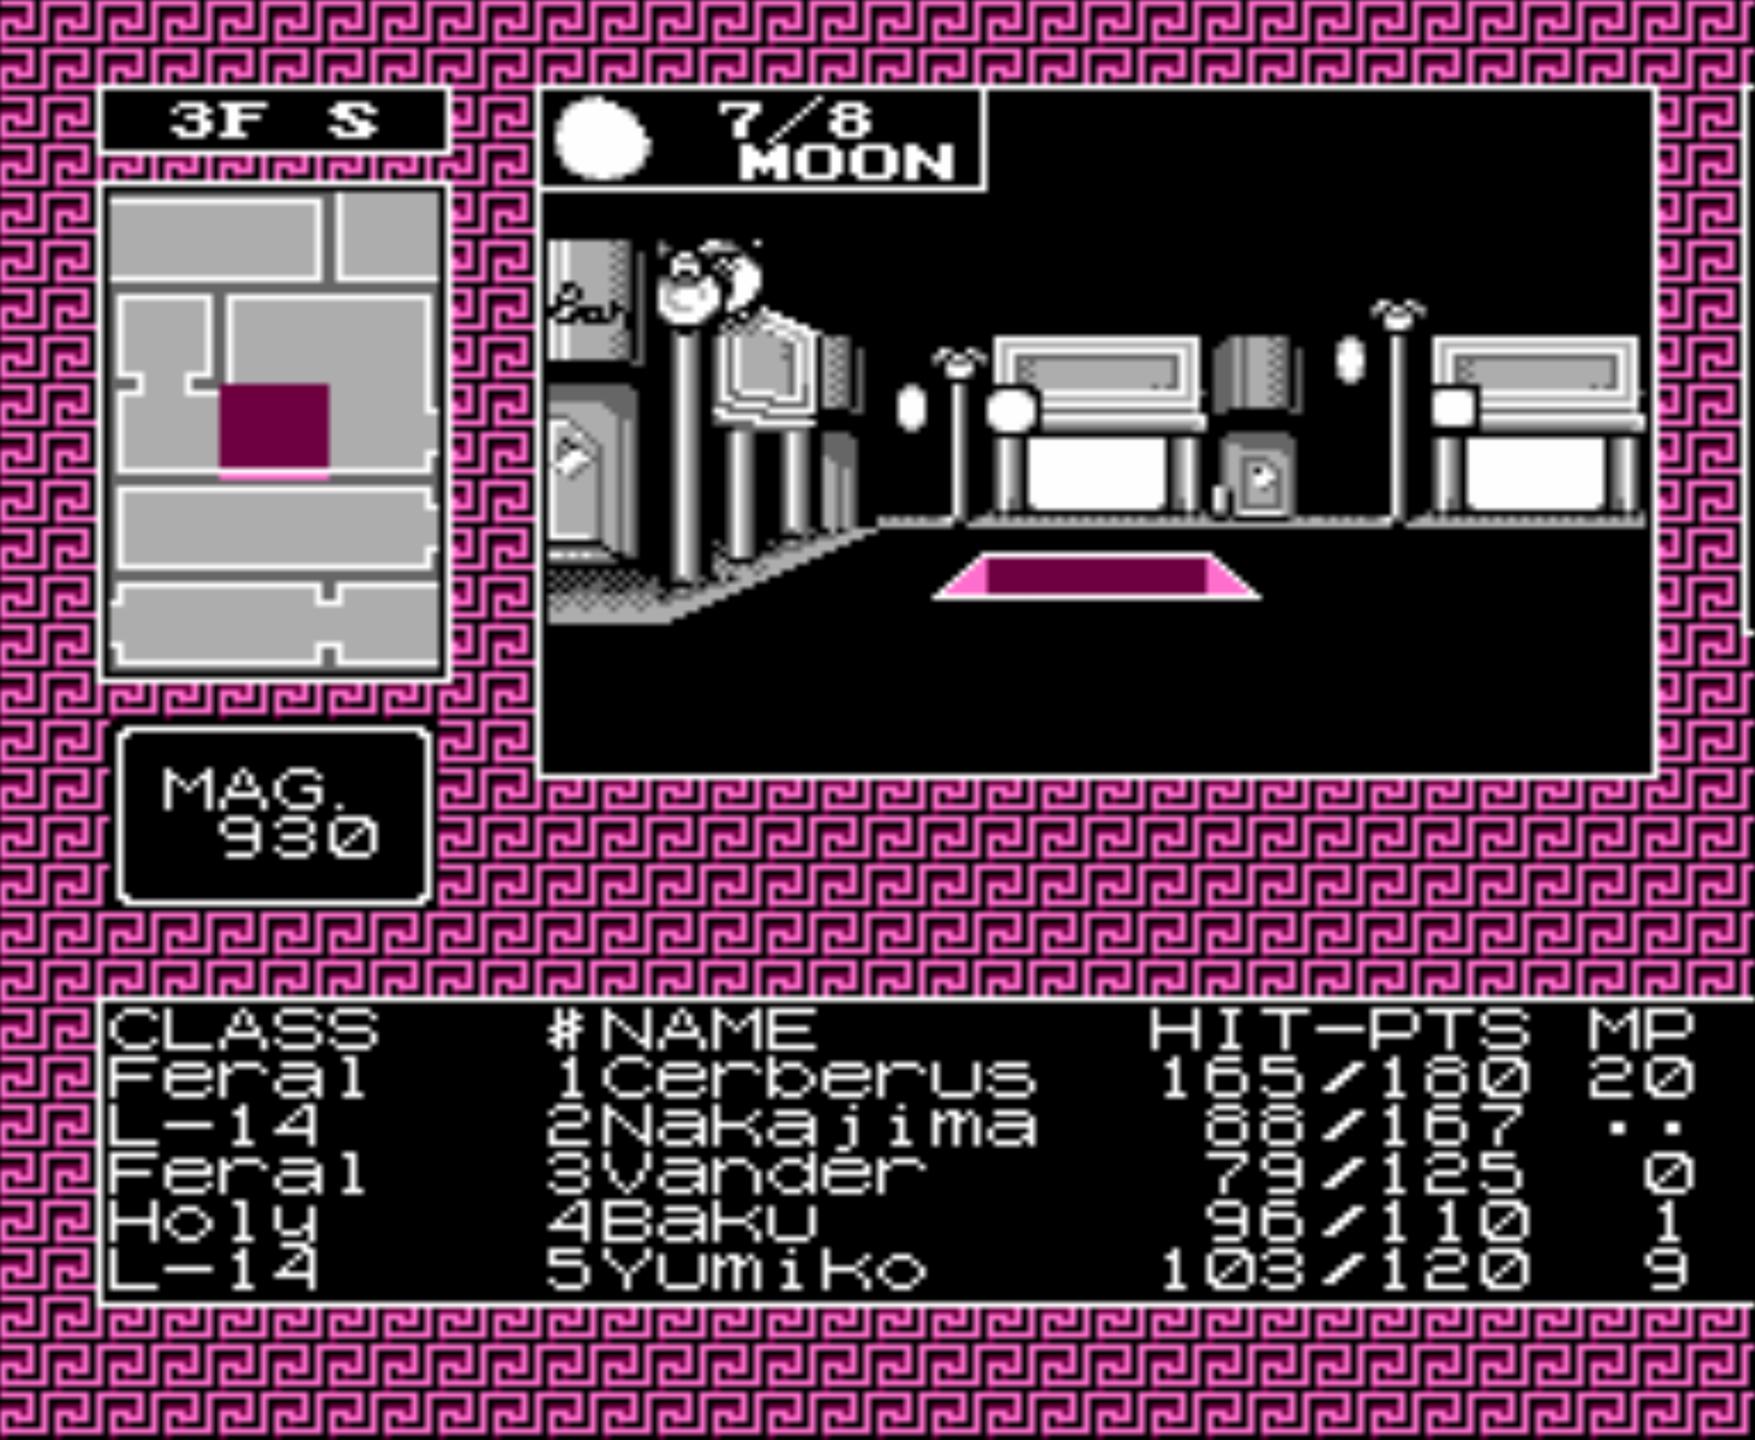 Just exploring a labyrinth with Cerberus, no big deal.